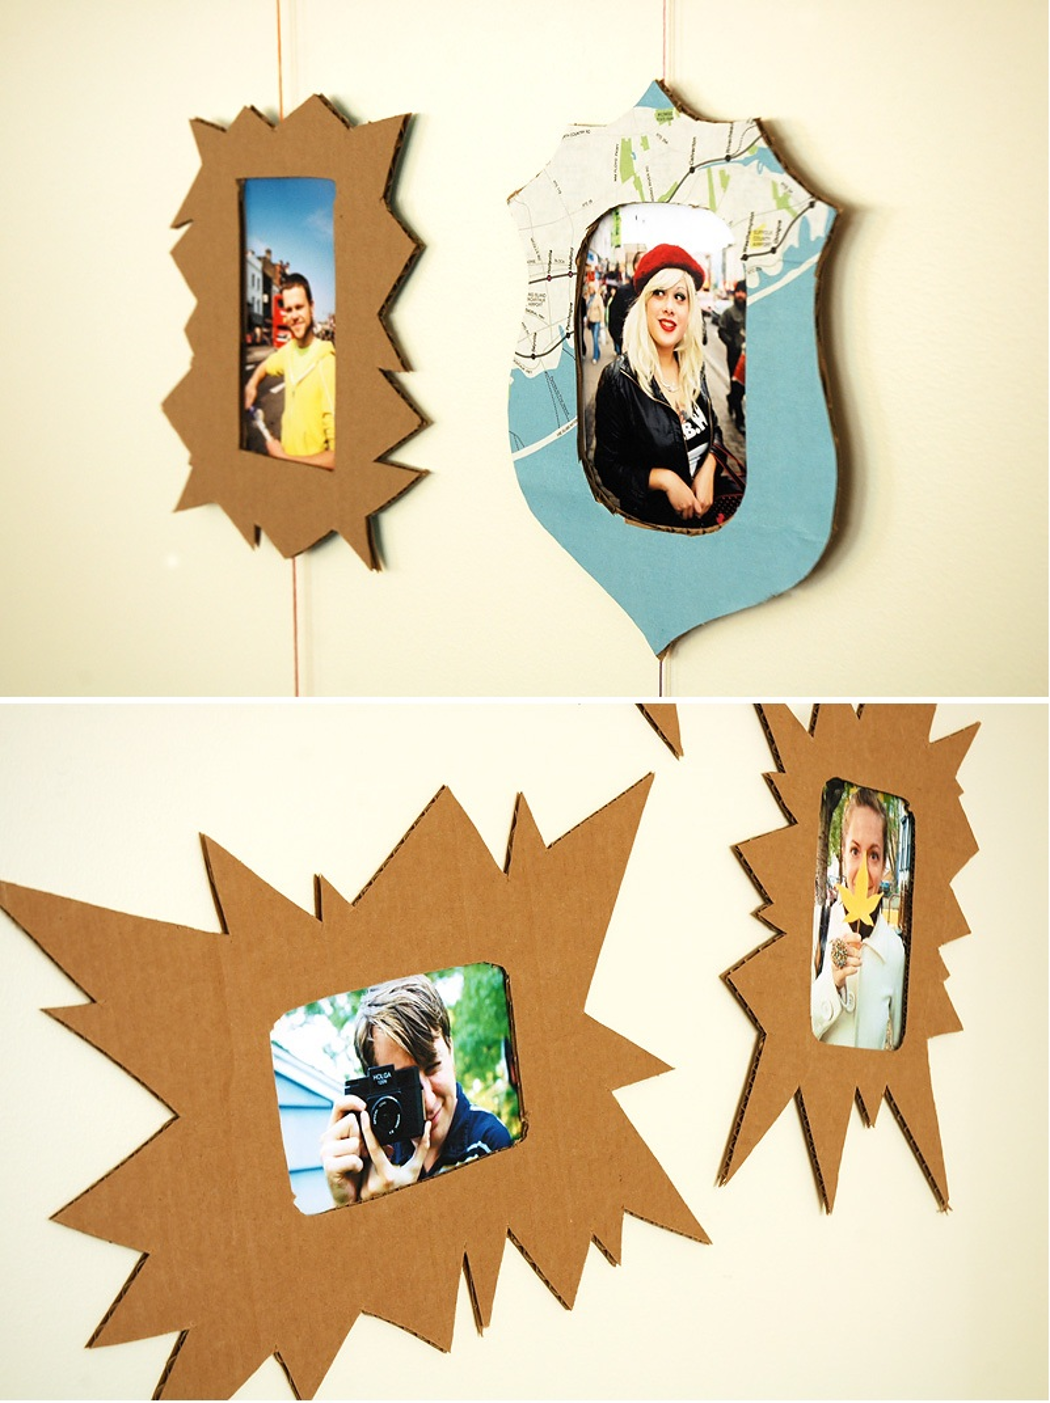 DIY Tutorial Cardboard / DIY Cardboard Picture Frames | Pinterest ...